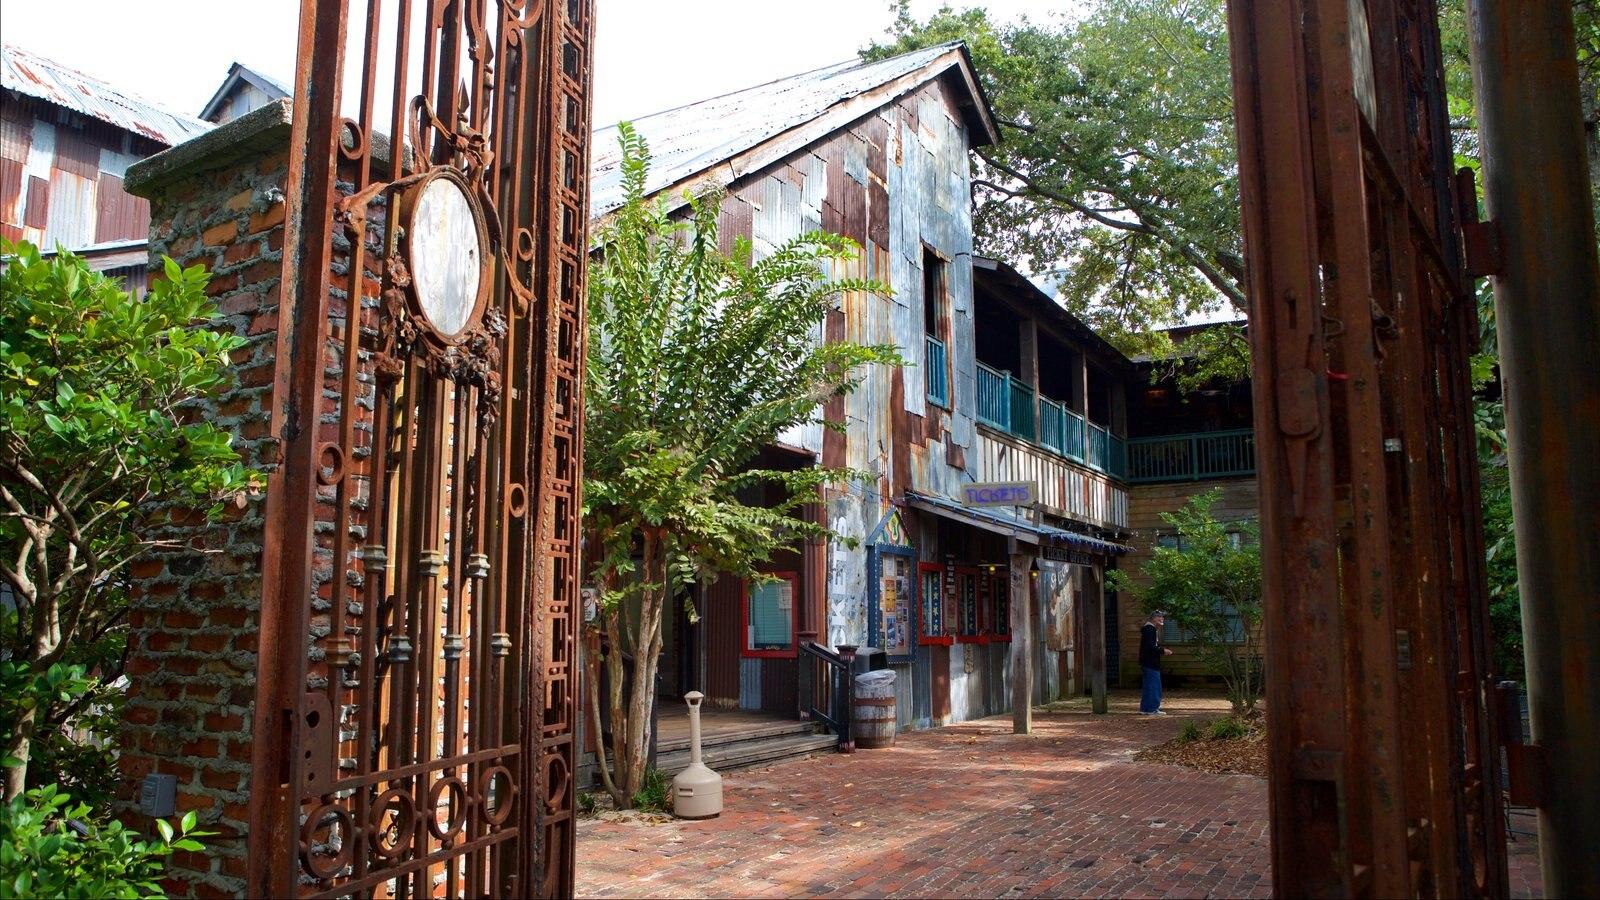 House of Blues Myrtle Beach que inclui elementos de patrimônio